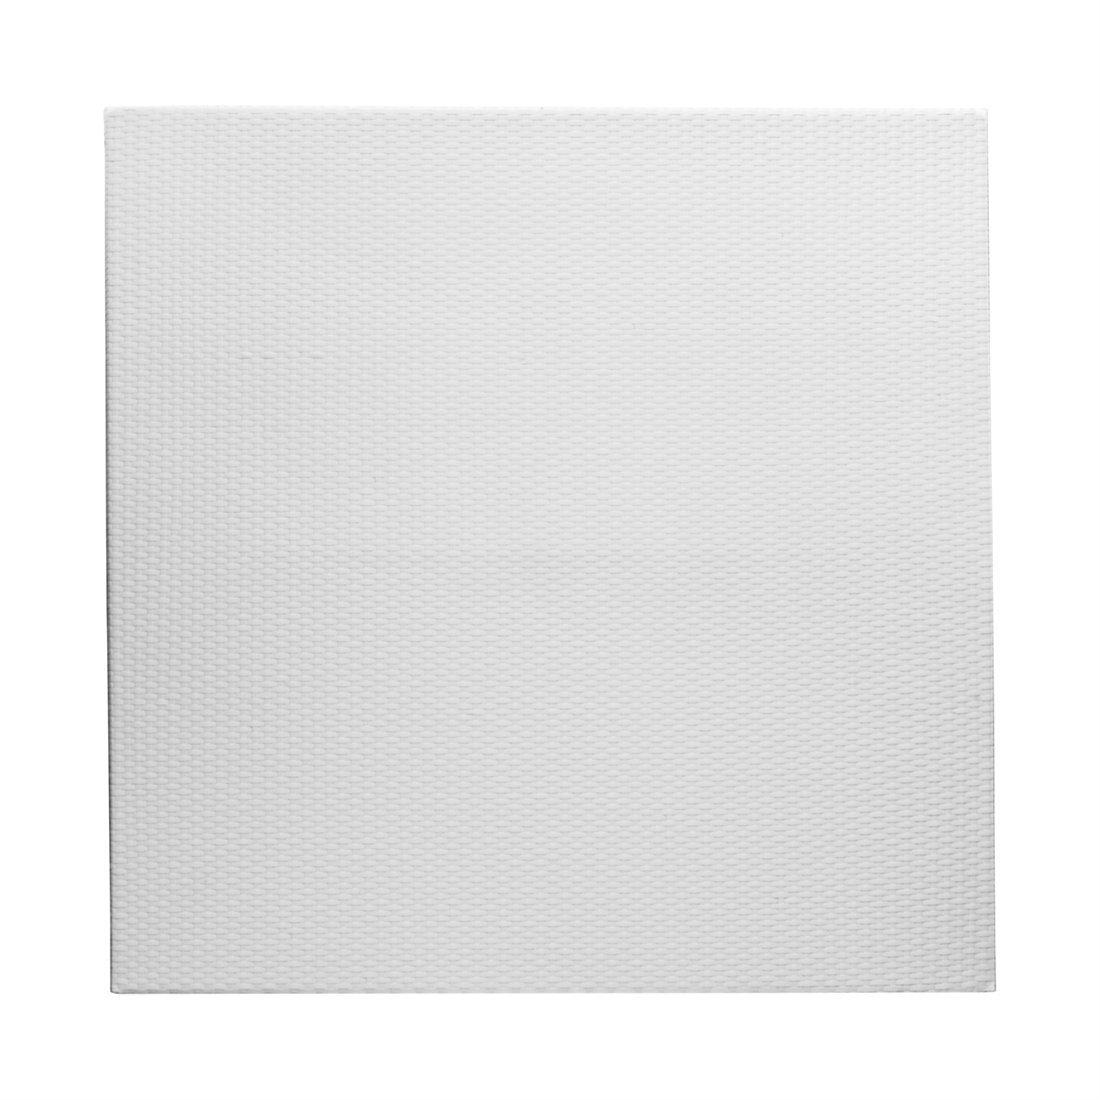 Gartenfreude Polyrattan Zaun Element 180 x 180 cm, 1 Stück, weiß, 2550-1015-208